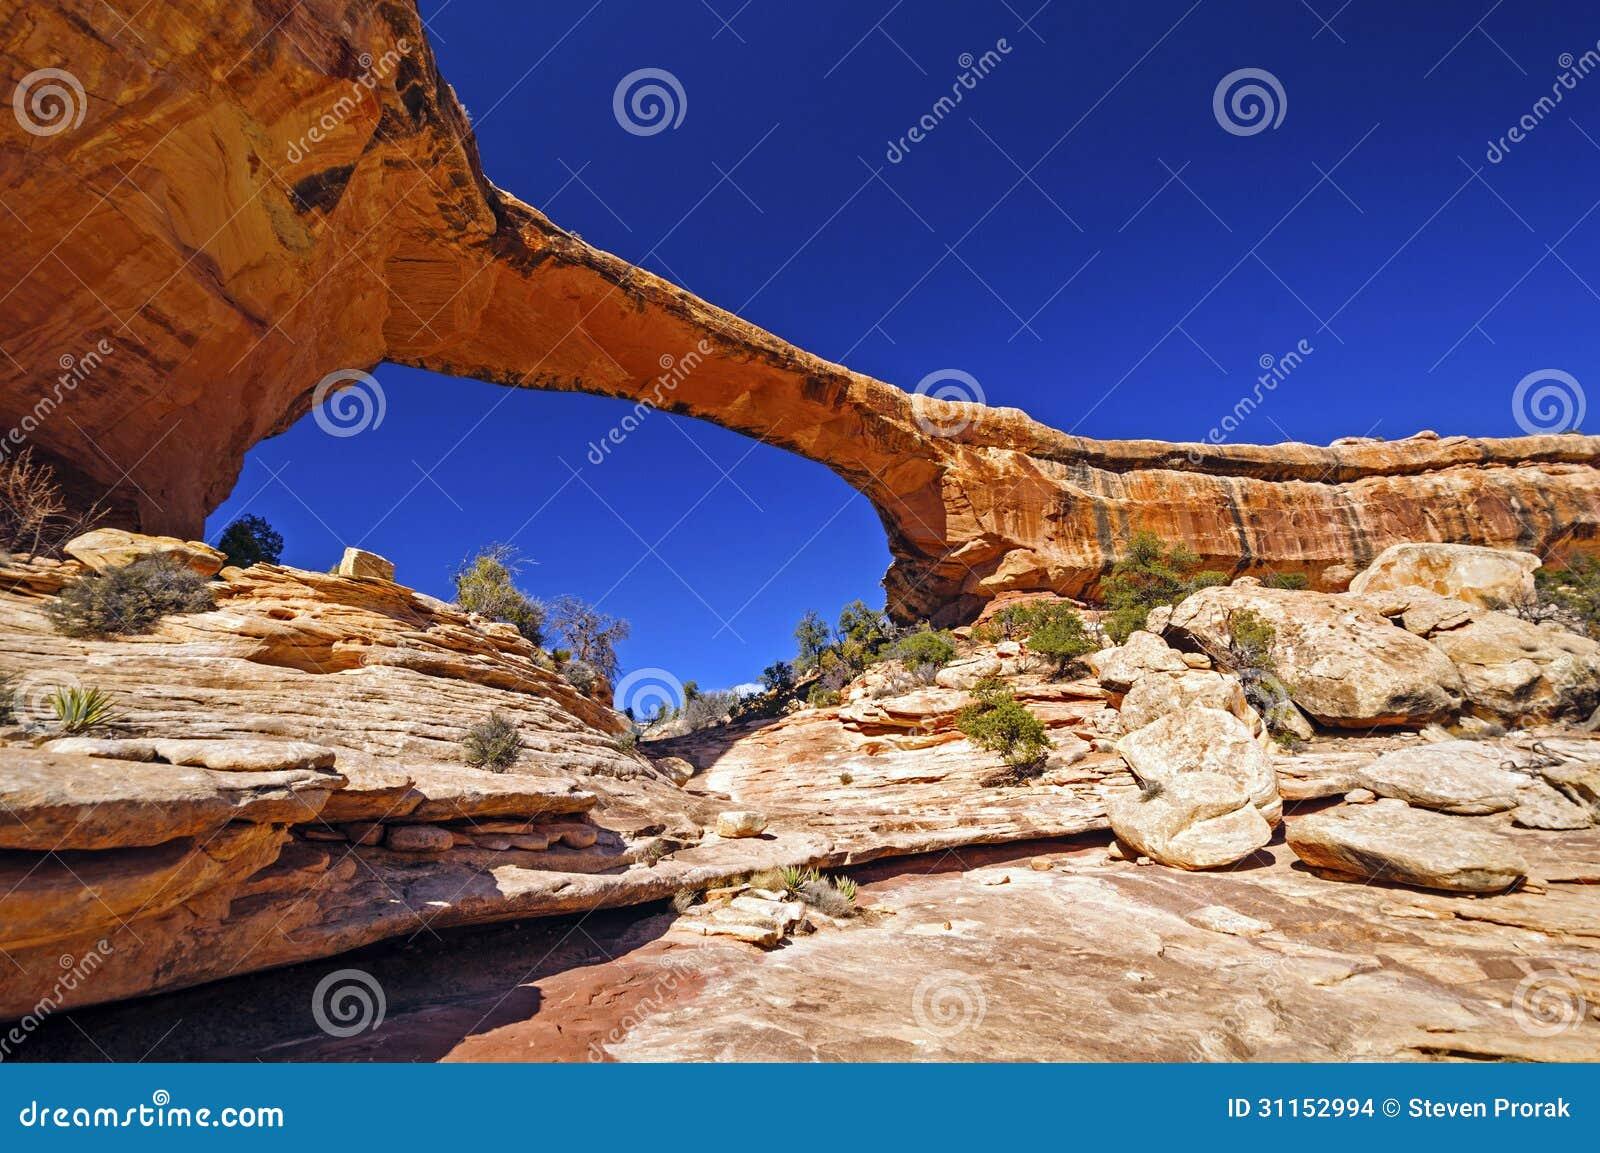 Natural Bridge in the Desert